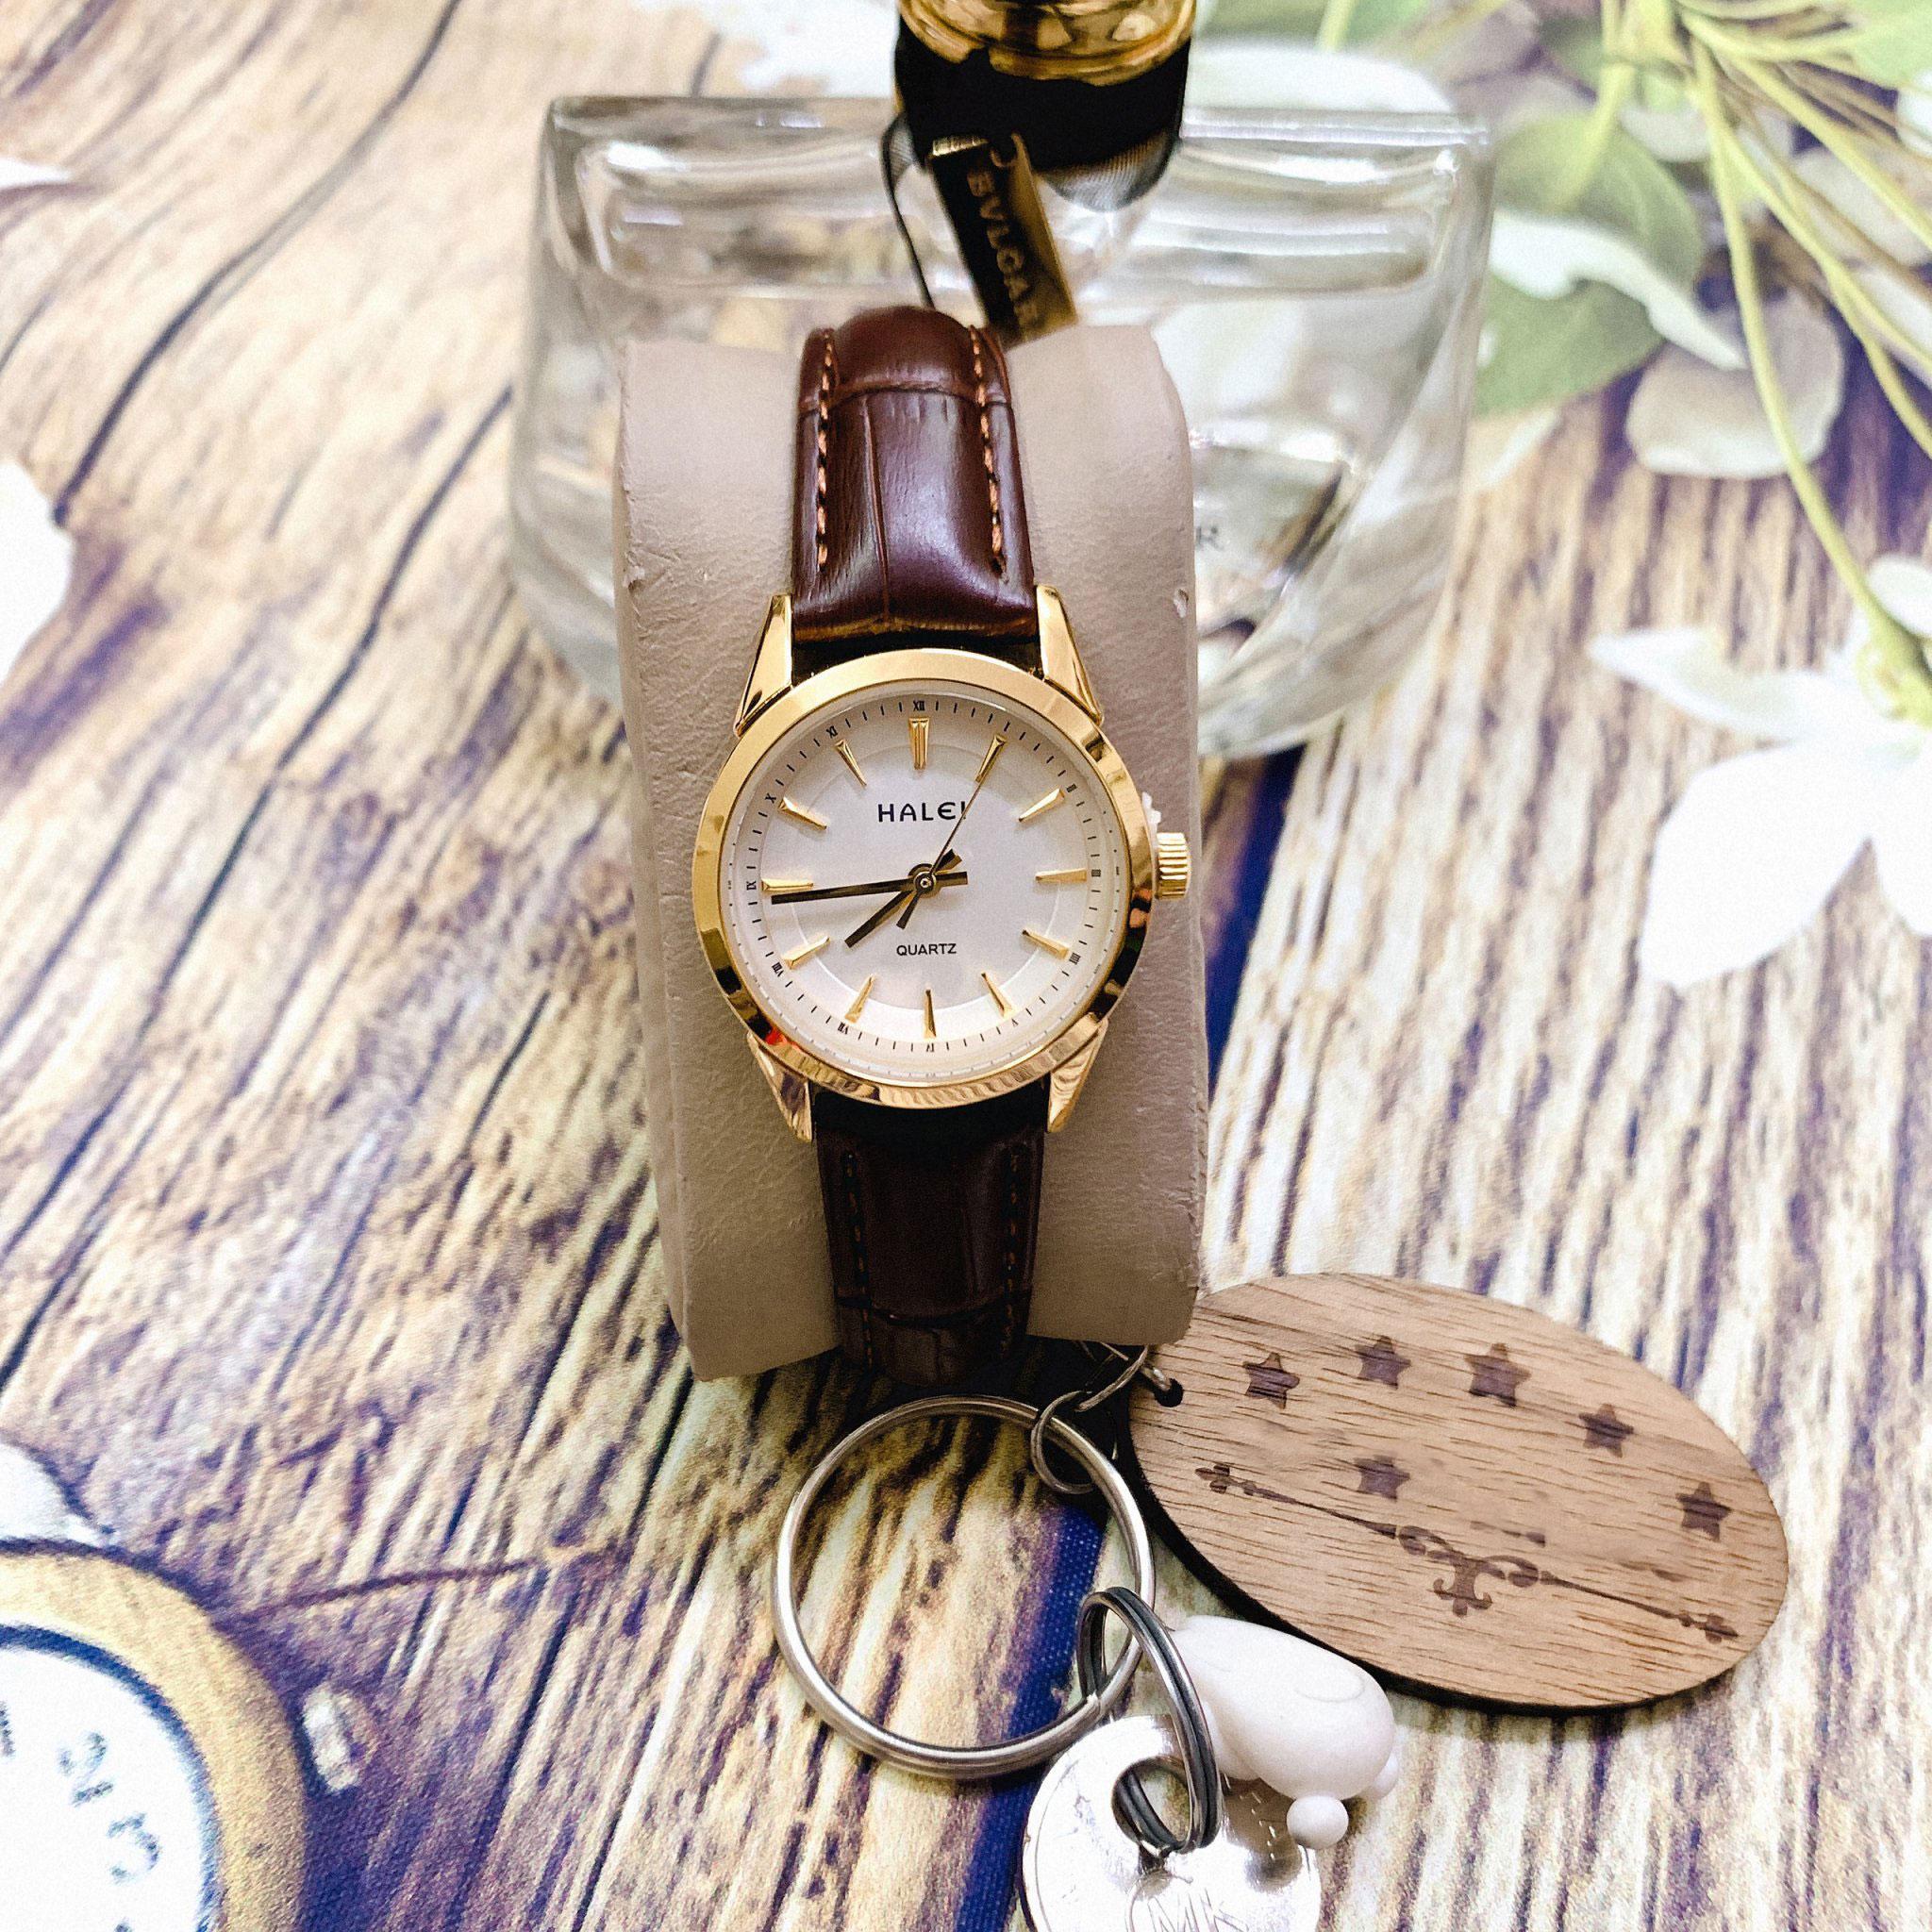 Đồng hồ Nữ Halei HL574 dây da cao cấp + Tặng Combo TẨY DA CHẾT APPLE WHITE PELLING GEL BEAUSKIN chính hãng